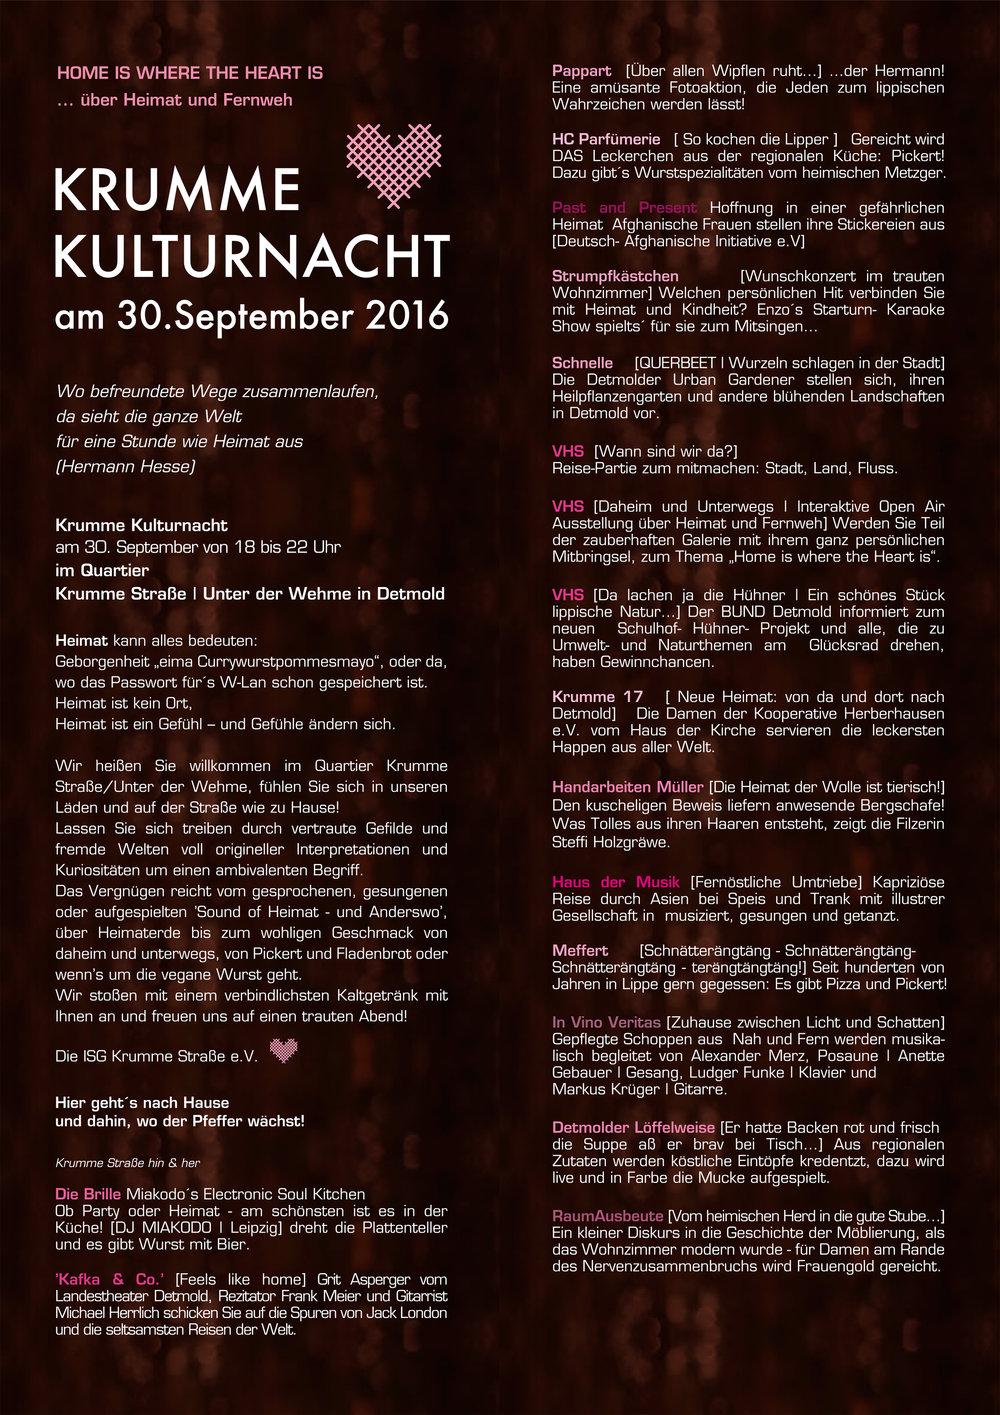 KKN_2016_Programm